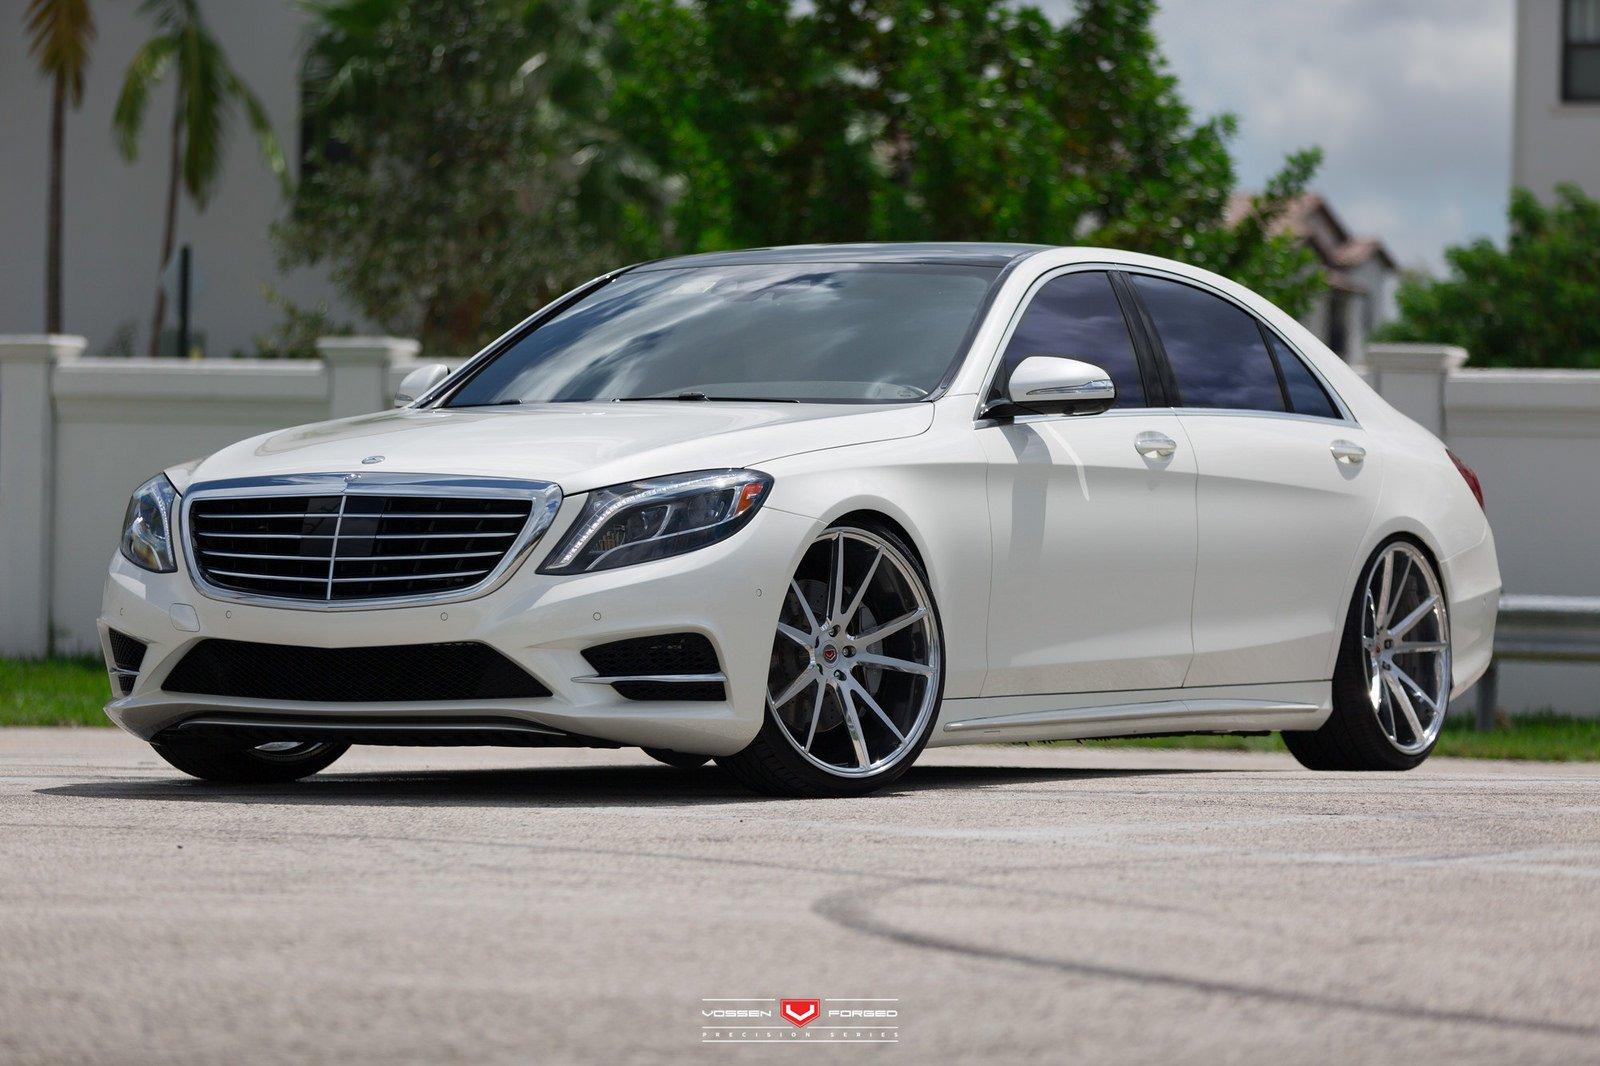 2017 Mercedes Benz S550 Sedan >> Mercedes S550 white sedan vossen wheels cars wallpaper | 1600x1066 | 820984 | WallpaperUP